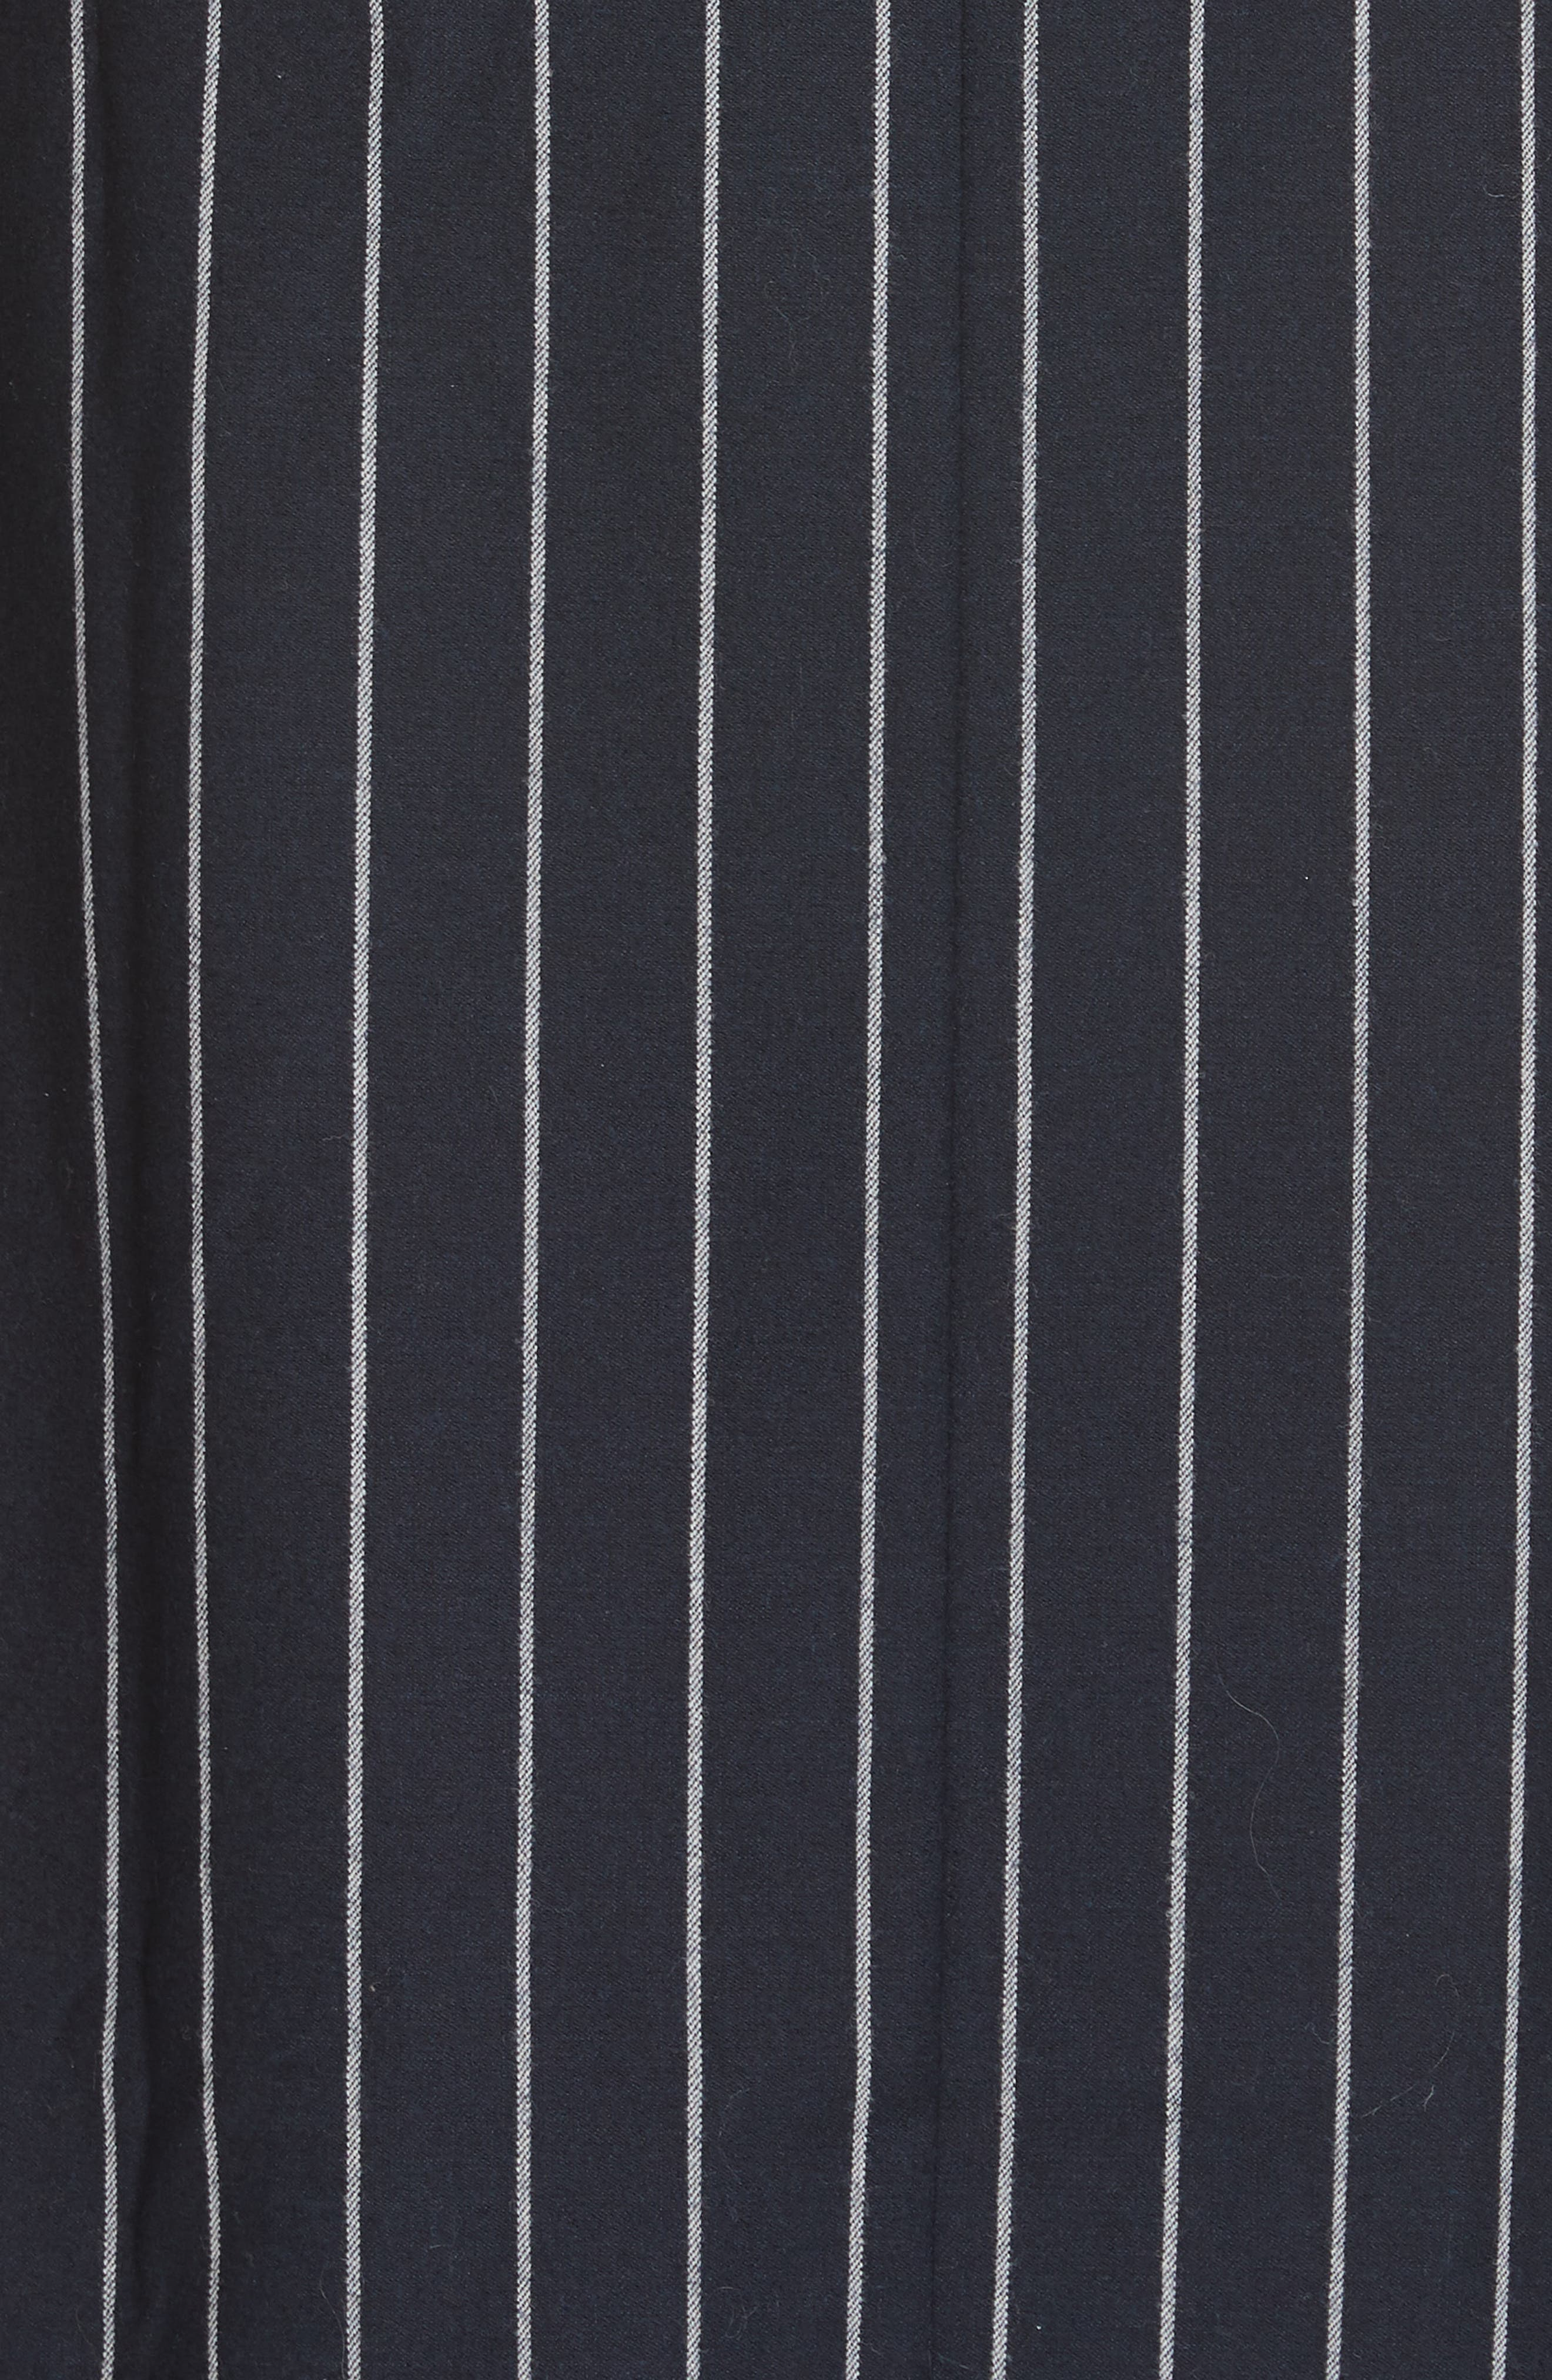 NORDSTROM SIGNATURE,                             Belted Shirtdress,                             Alternate thumbnail 6, color,                             NAVY- WHITE PREPPY STRIPE